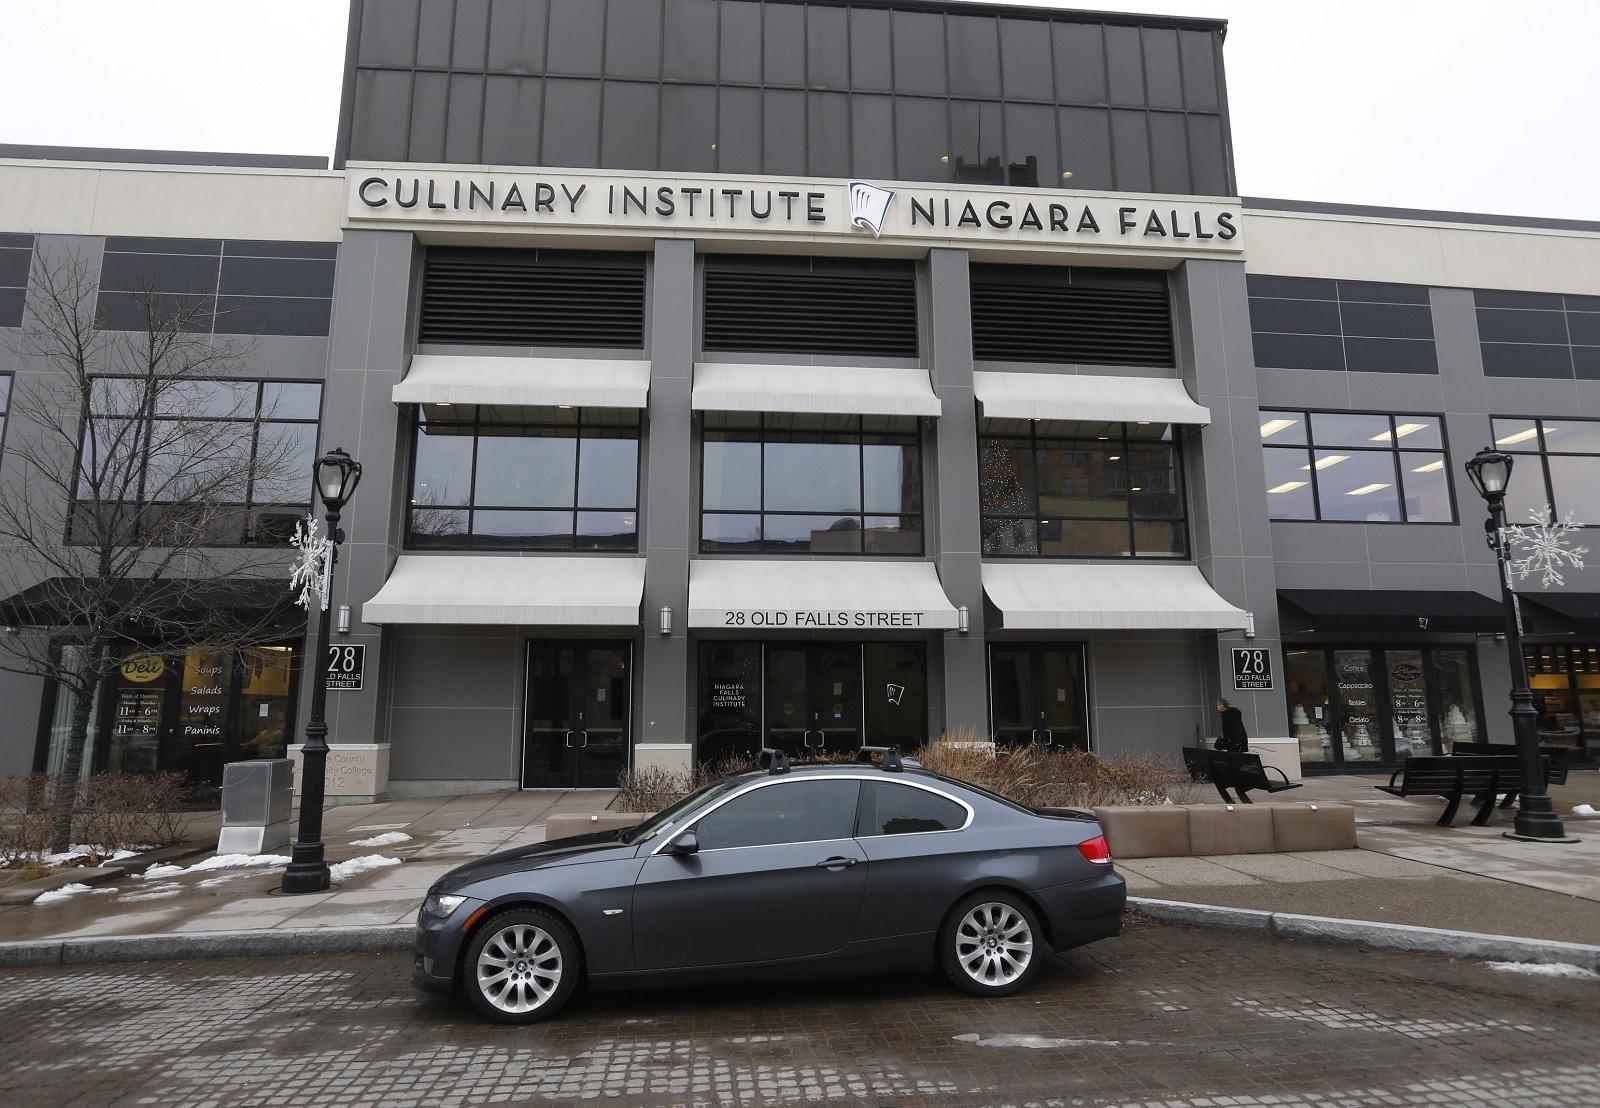 Niagara Falls Culinary Institute on Old Falls Street in Niagara Falls will host several Jingle Falls USA events. (Robert Kirkham/News file photo)